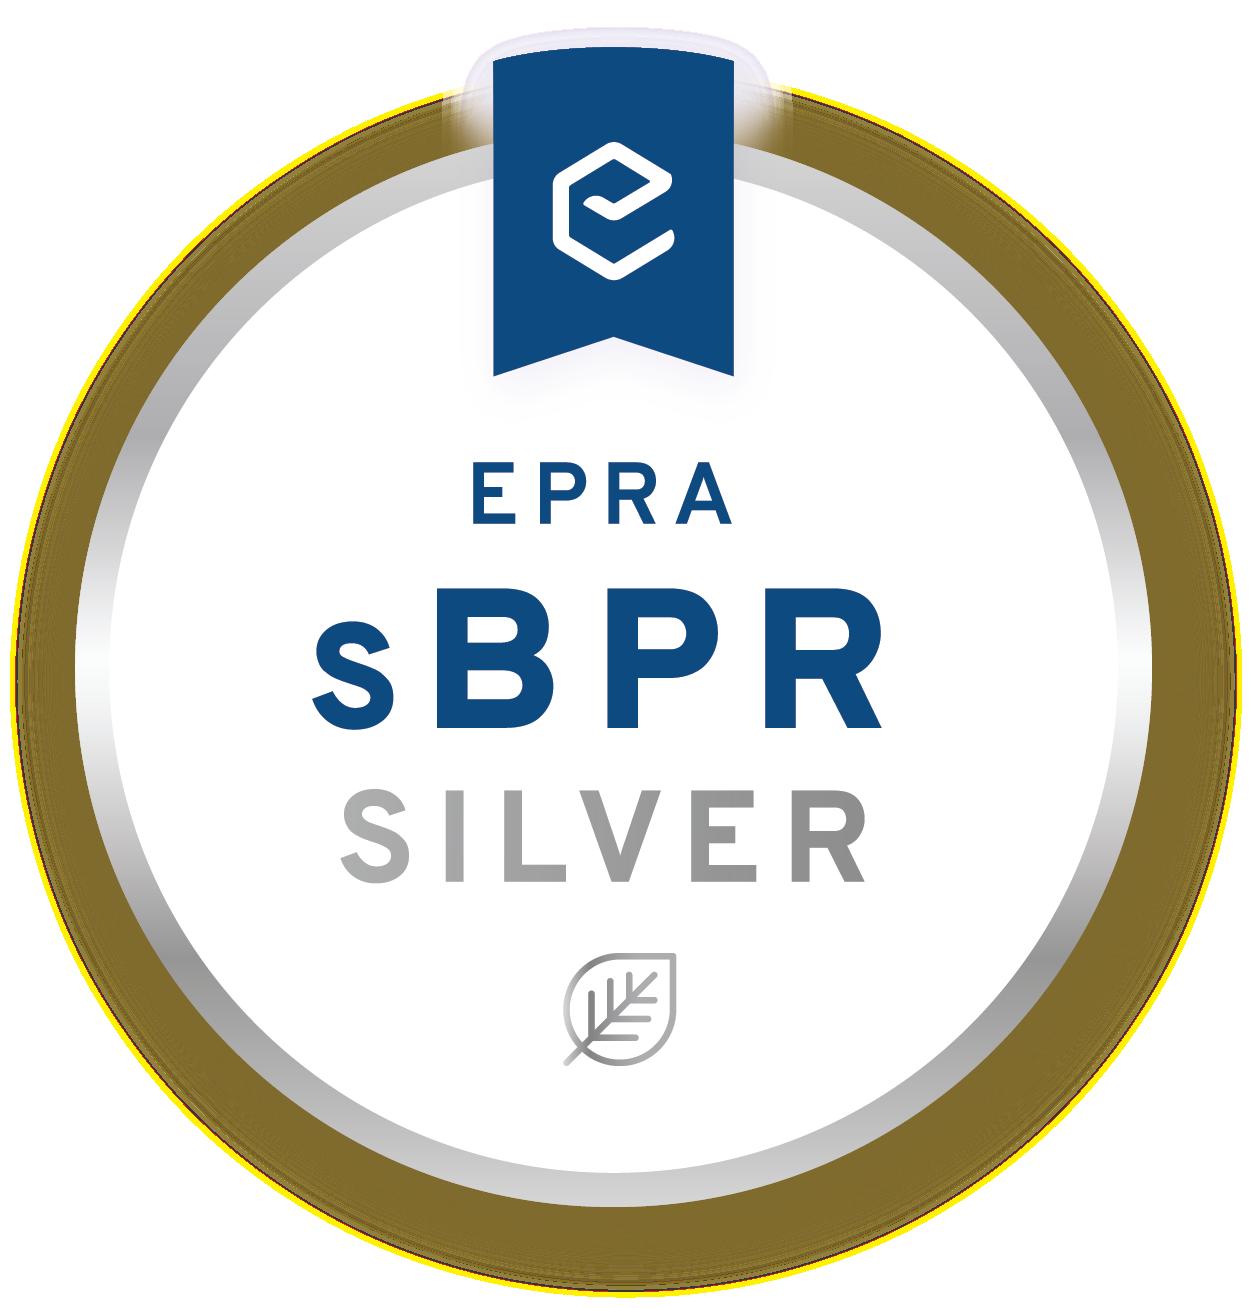 sBPR Award Silver